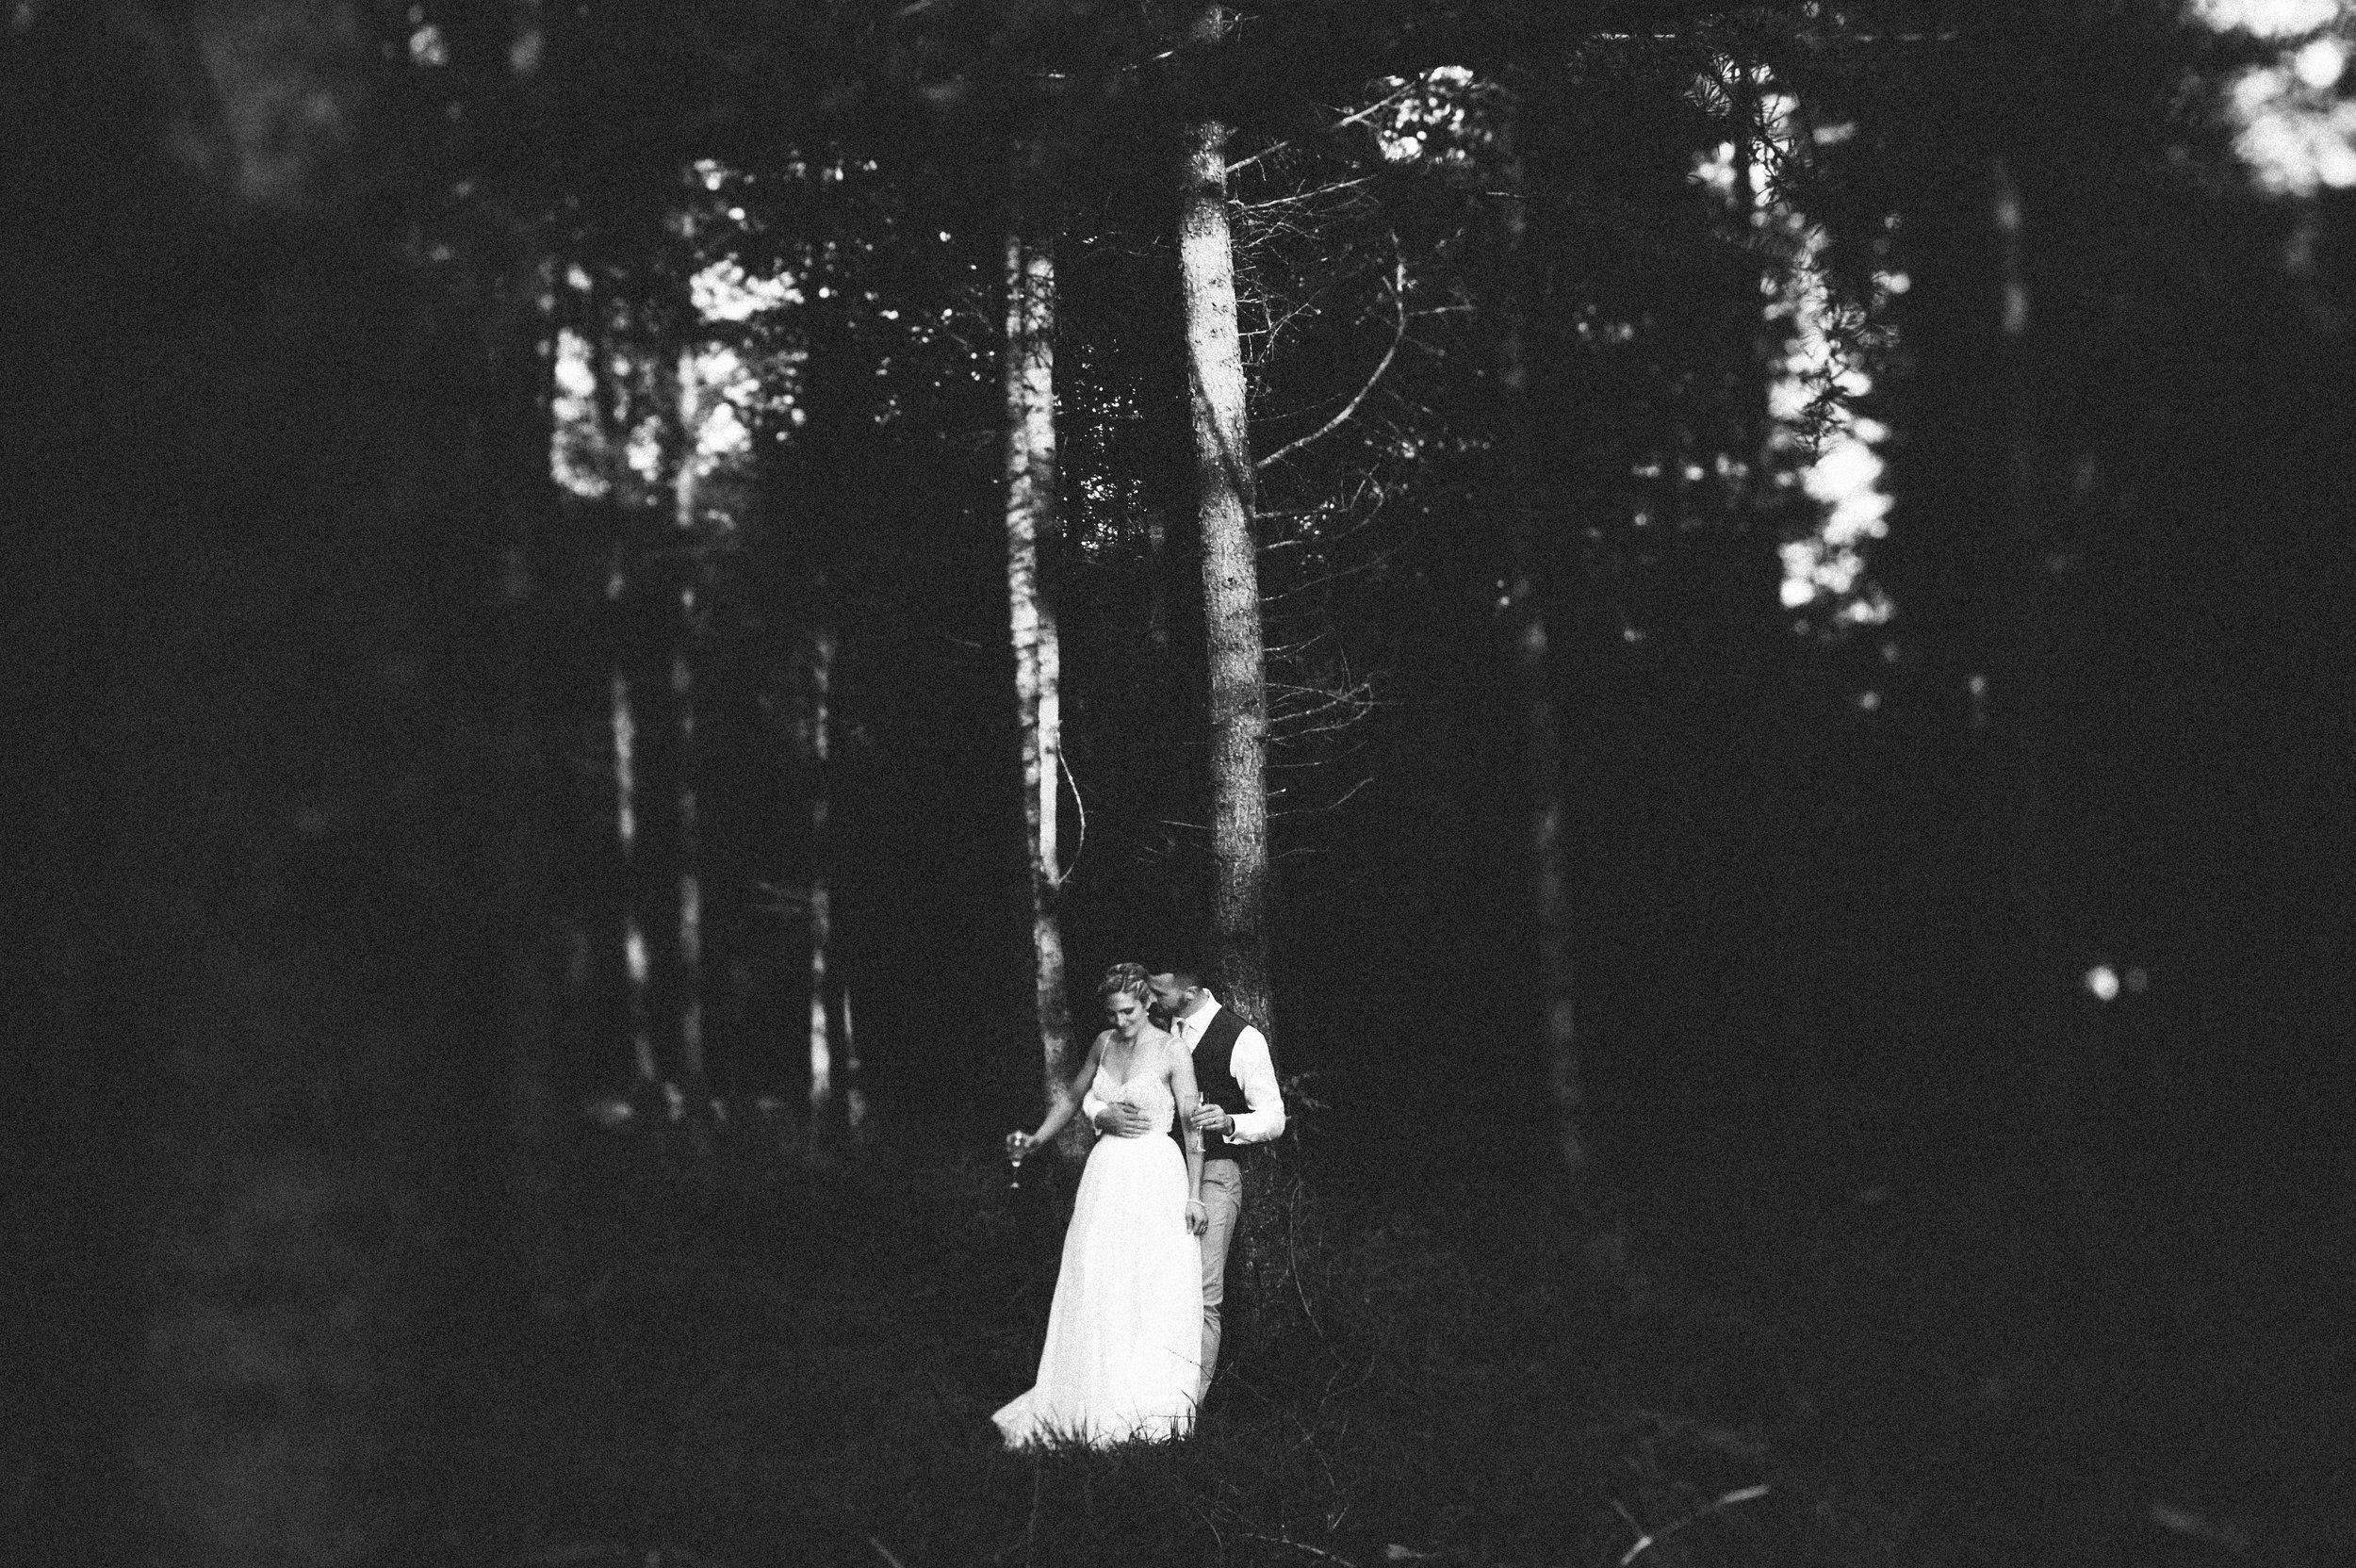 alternative wedding photography cornwall harrera images-019.jpg